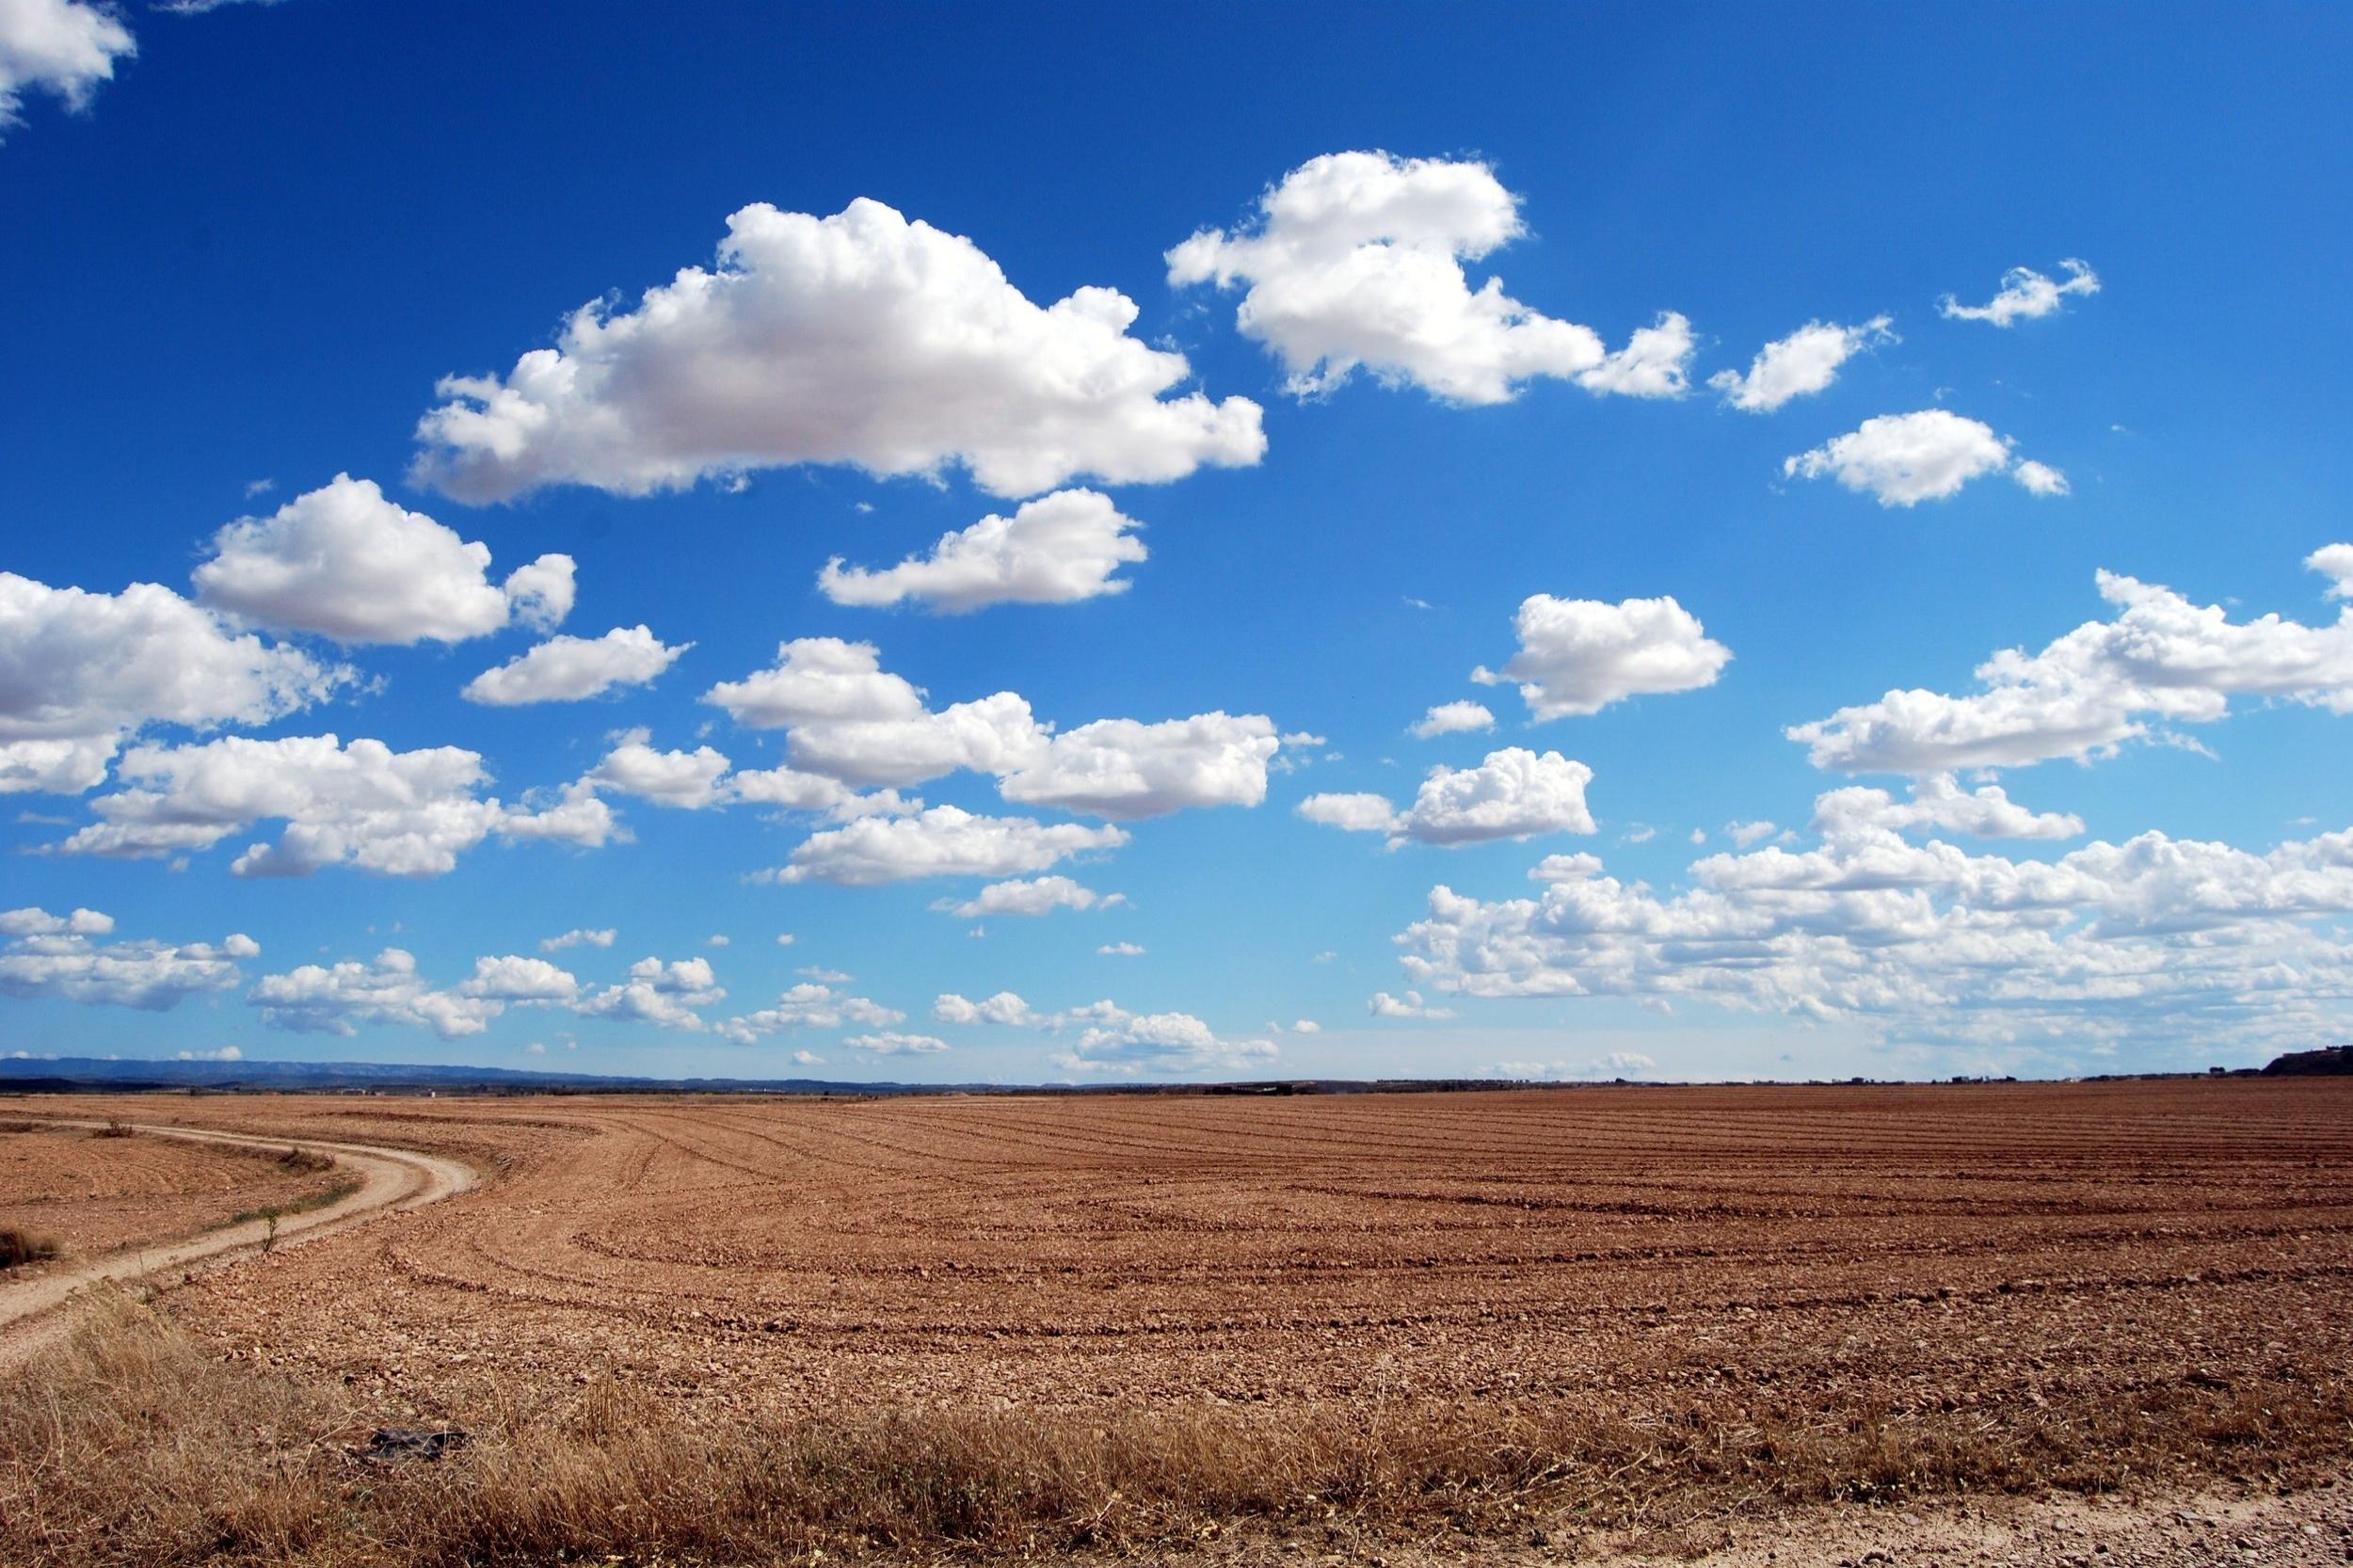 agriculture-arid-bright-46160.jpg